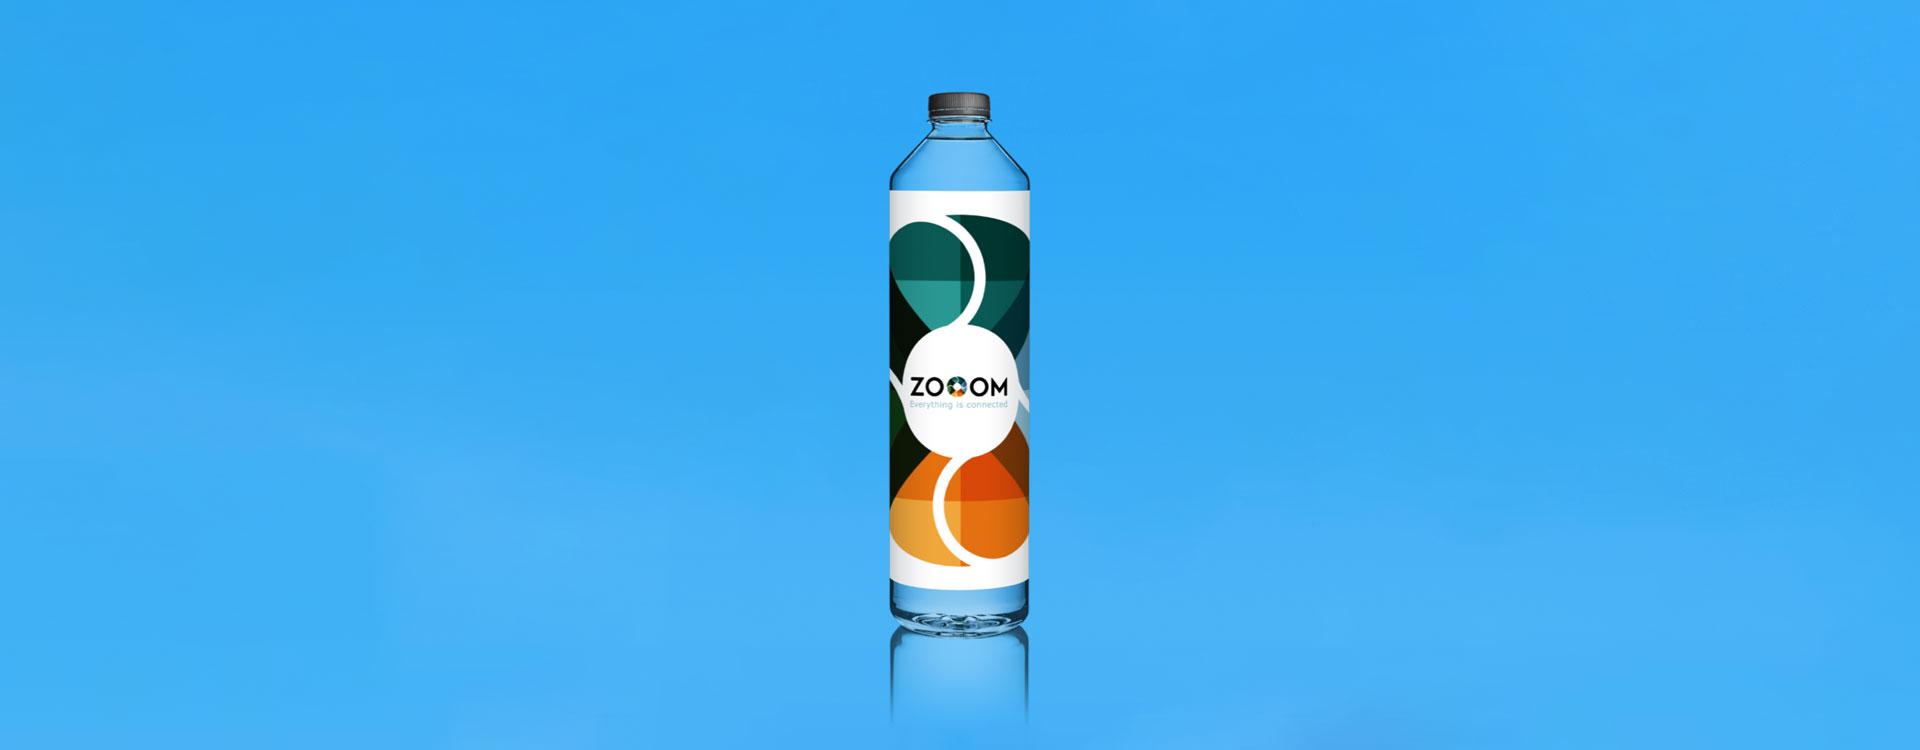 Event branding ZOOOM festival water bottle